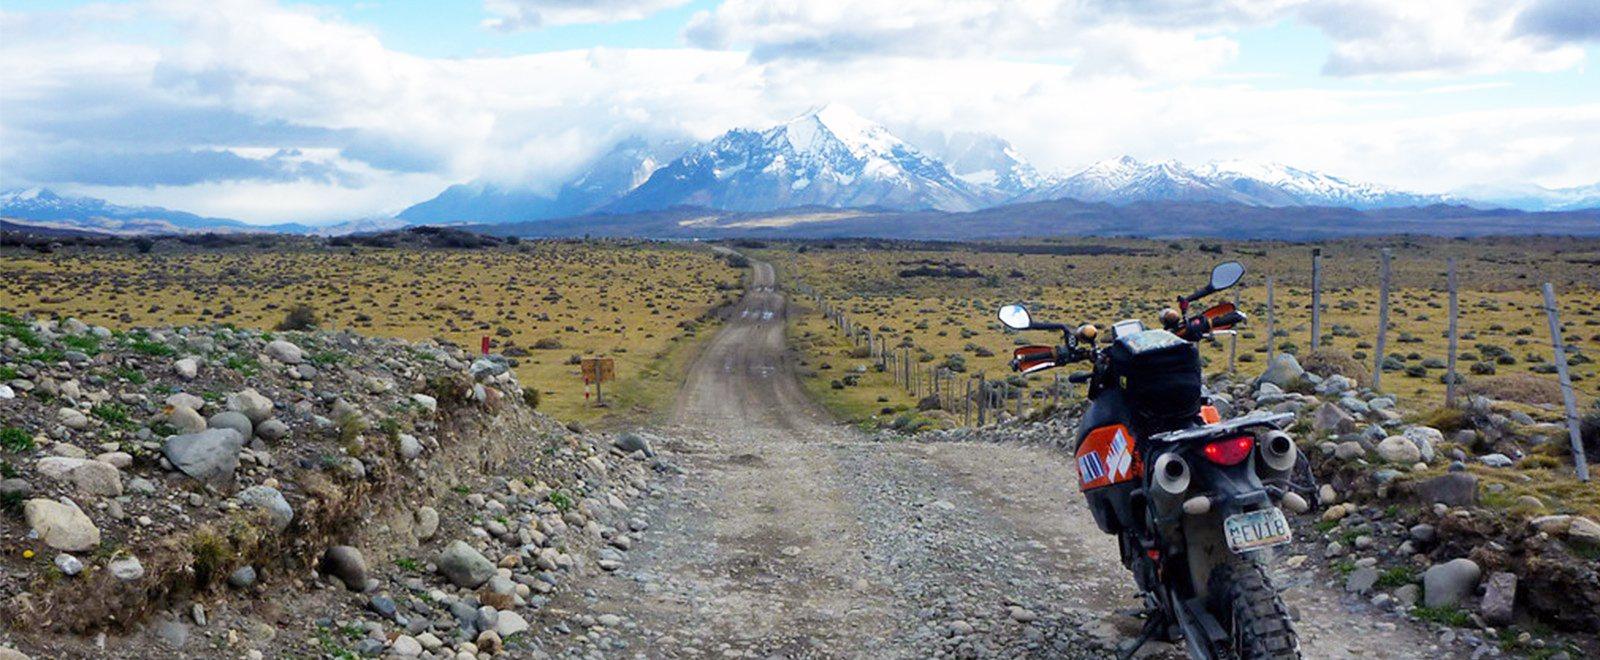 ktm-patagonia-off-road-motorbike-trip